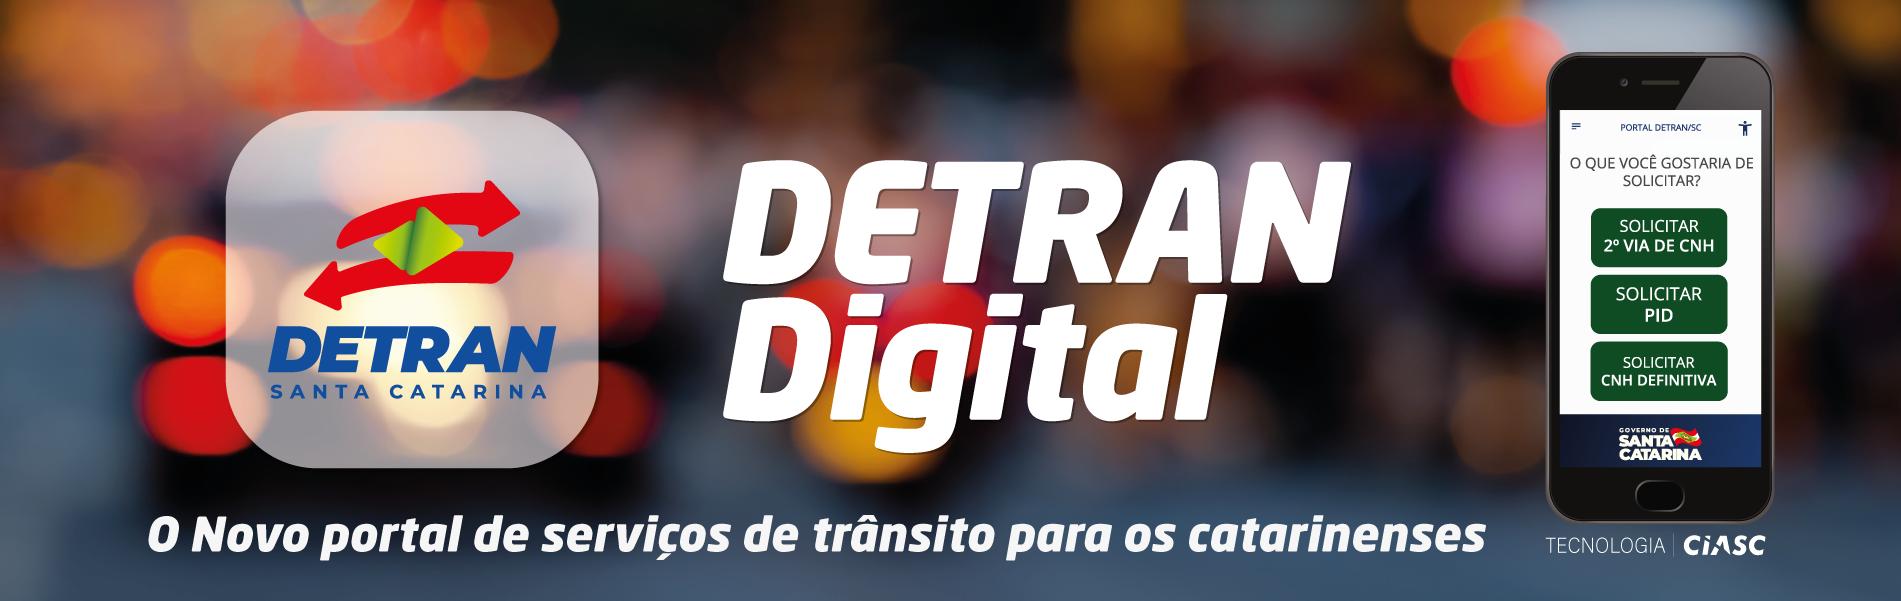 banner_detran_digital_3